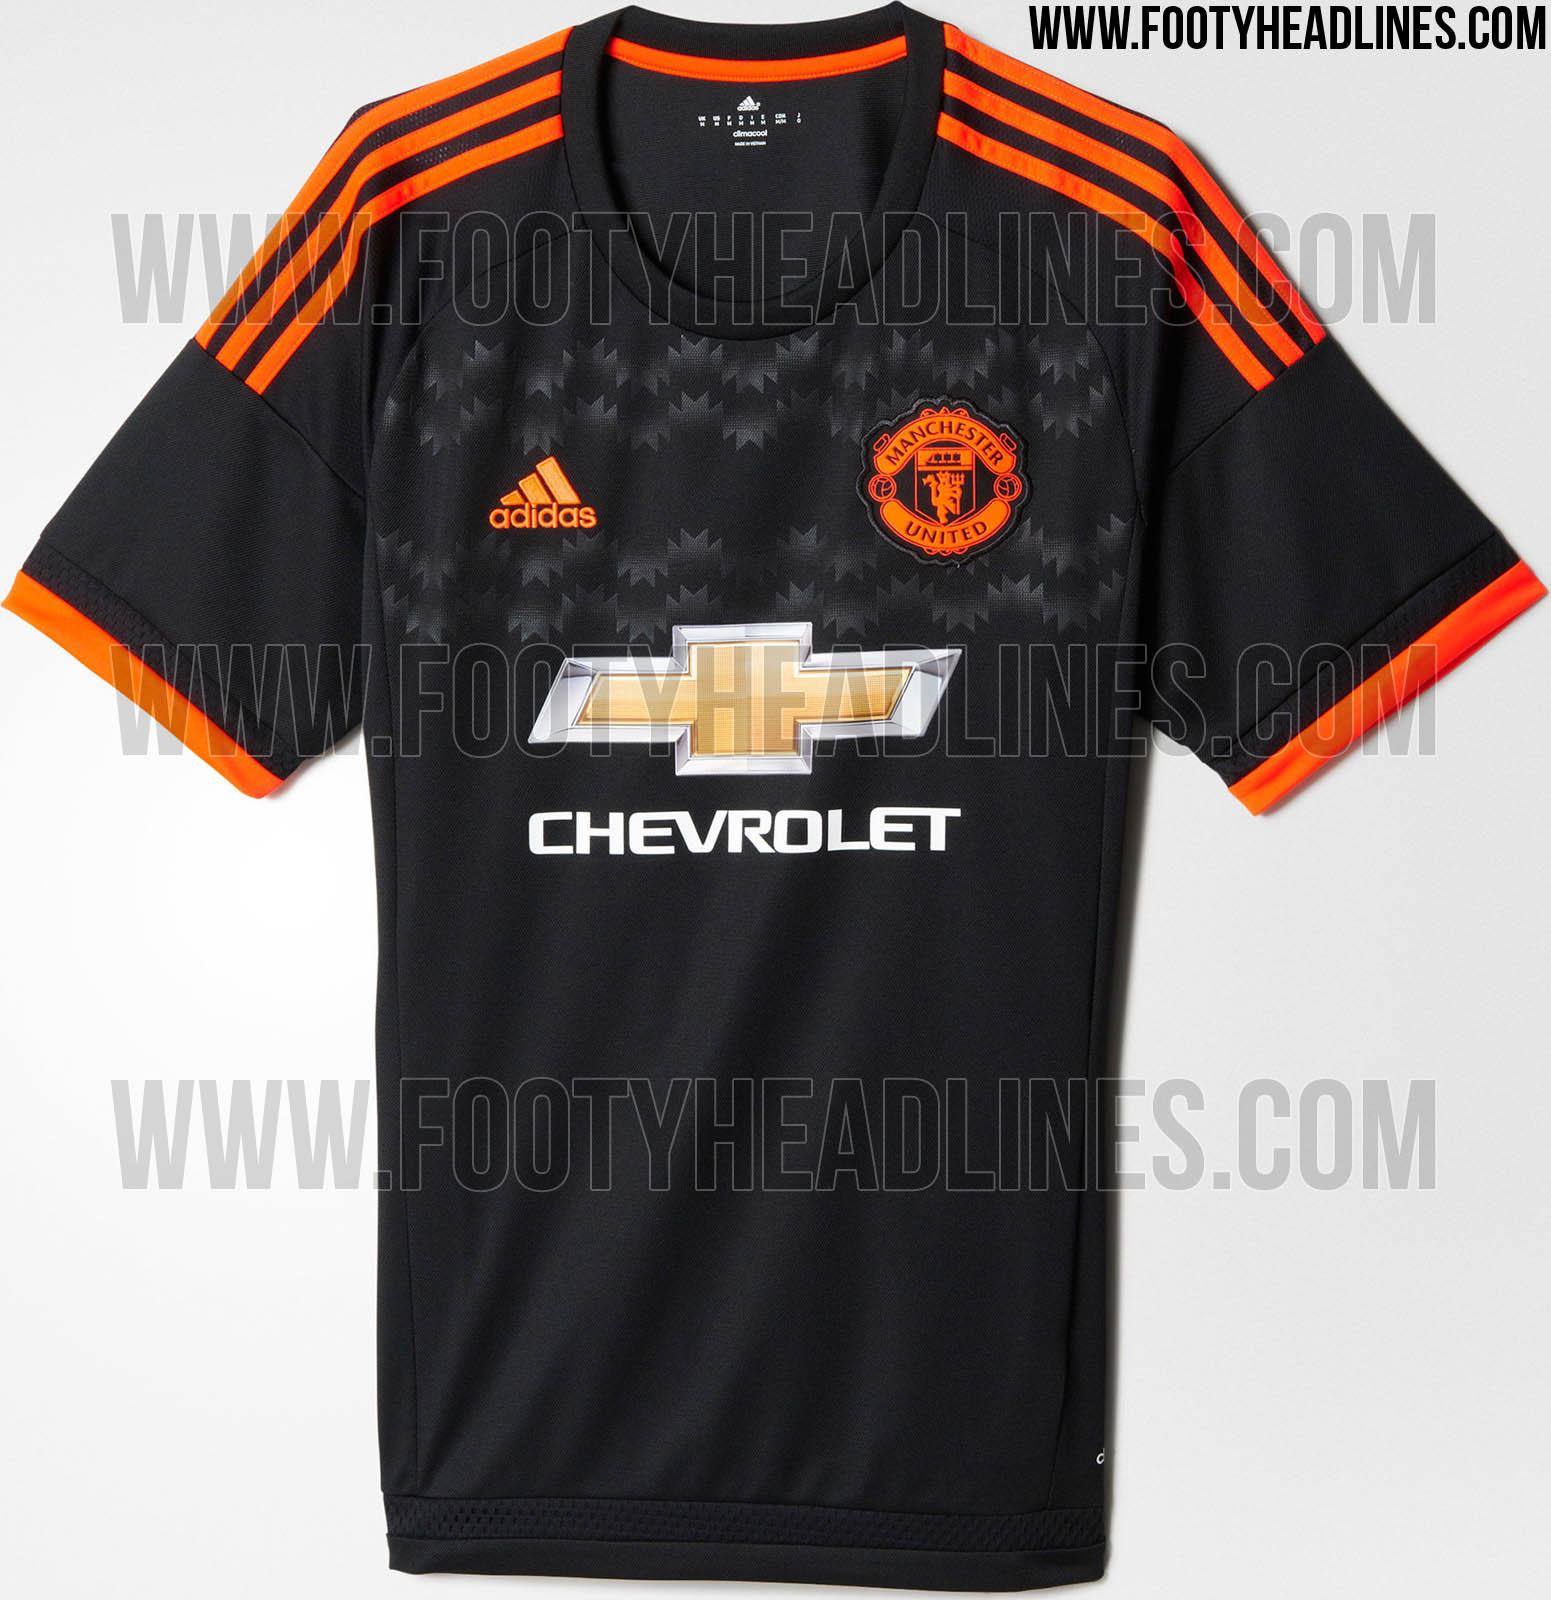 the latest 5a6c3 8b600 New Manchester United Home Shirt 2015 16 | Azərbaycan Dillər ...